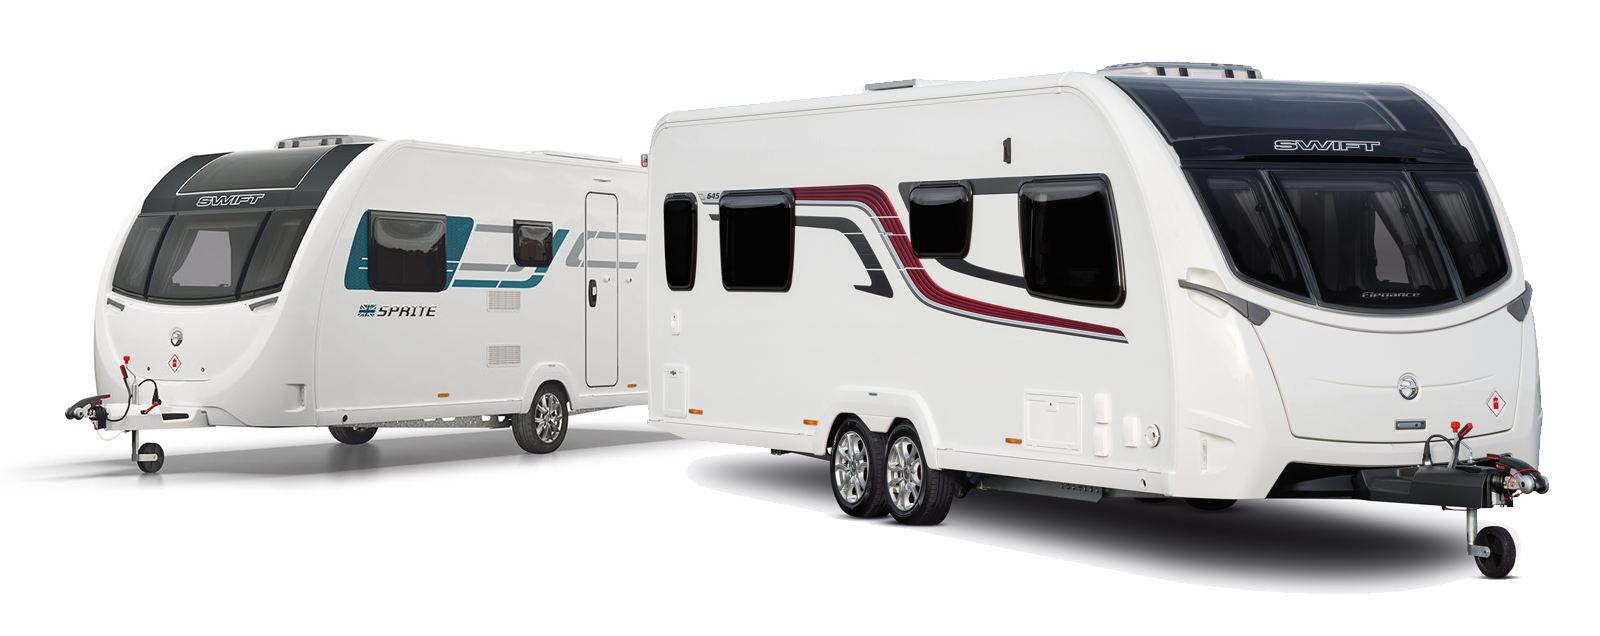 Welcome Leisure Sales – Cheshire's Premier Caravan Dealer for New